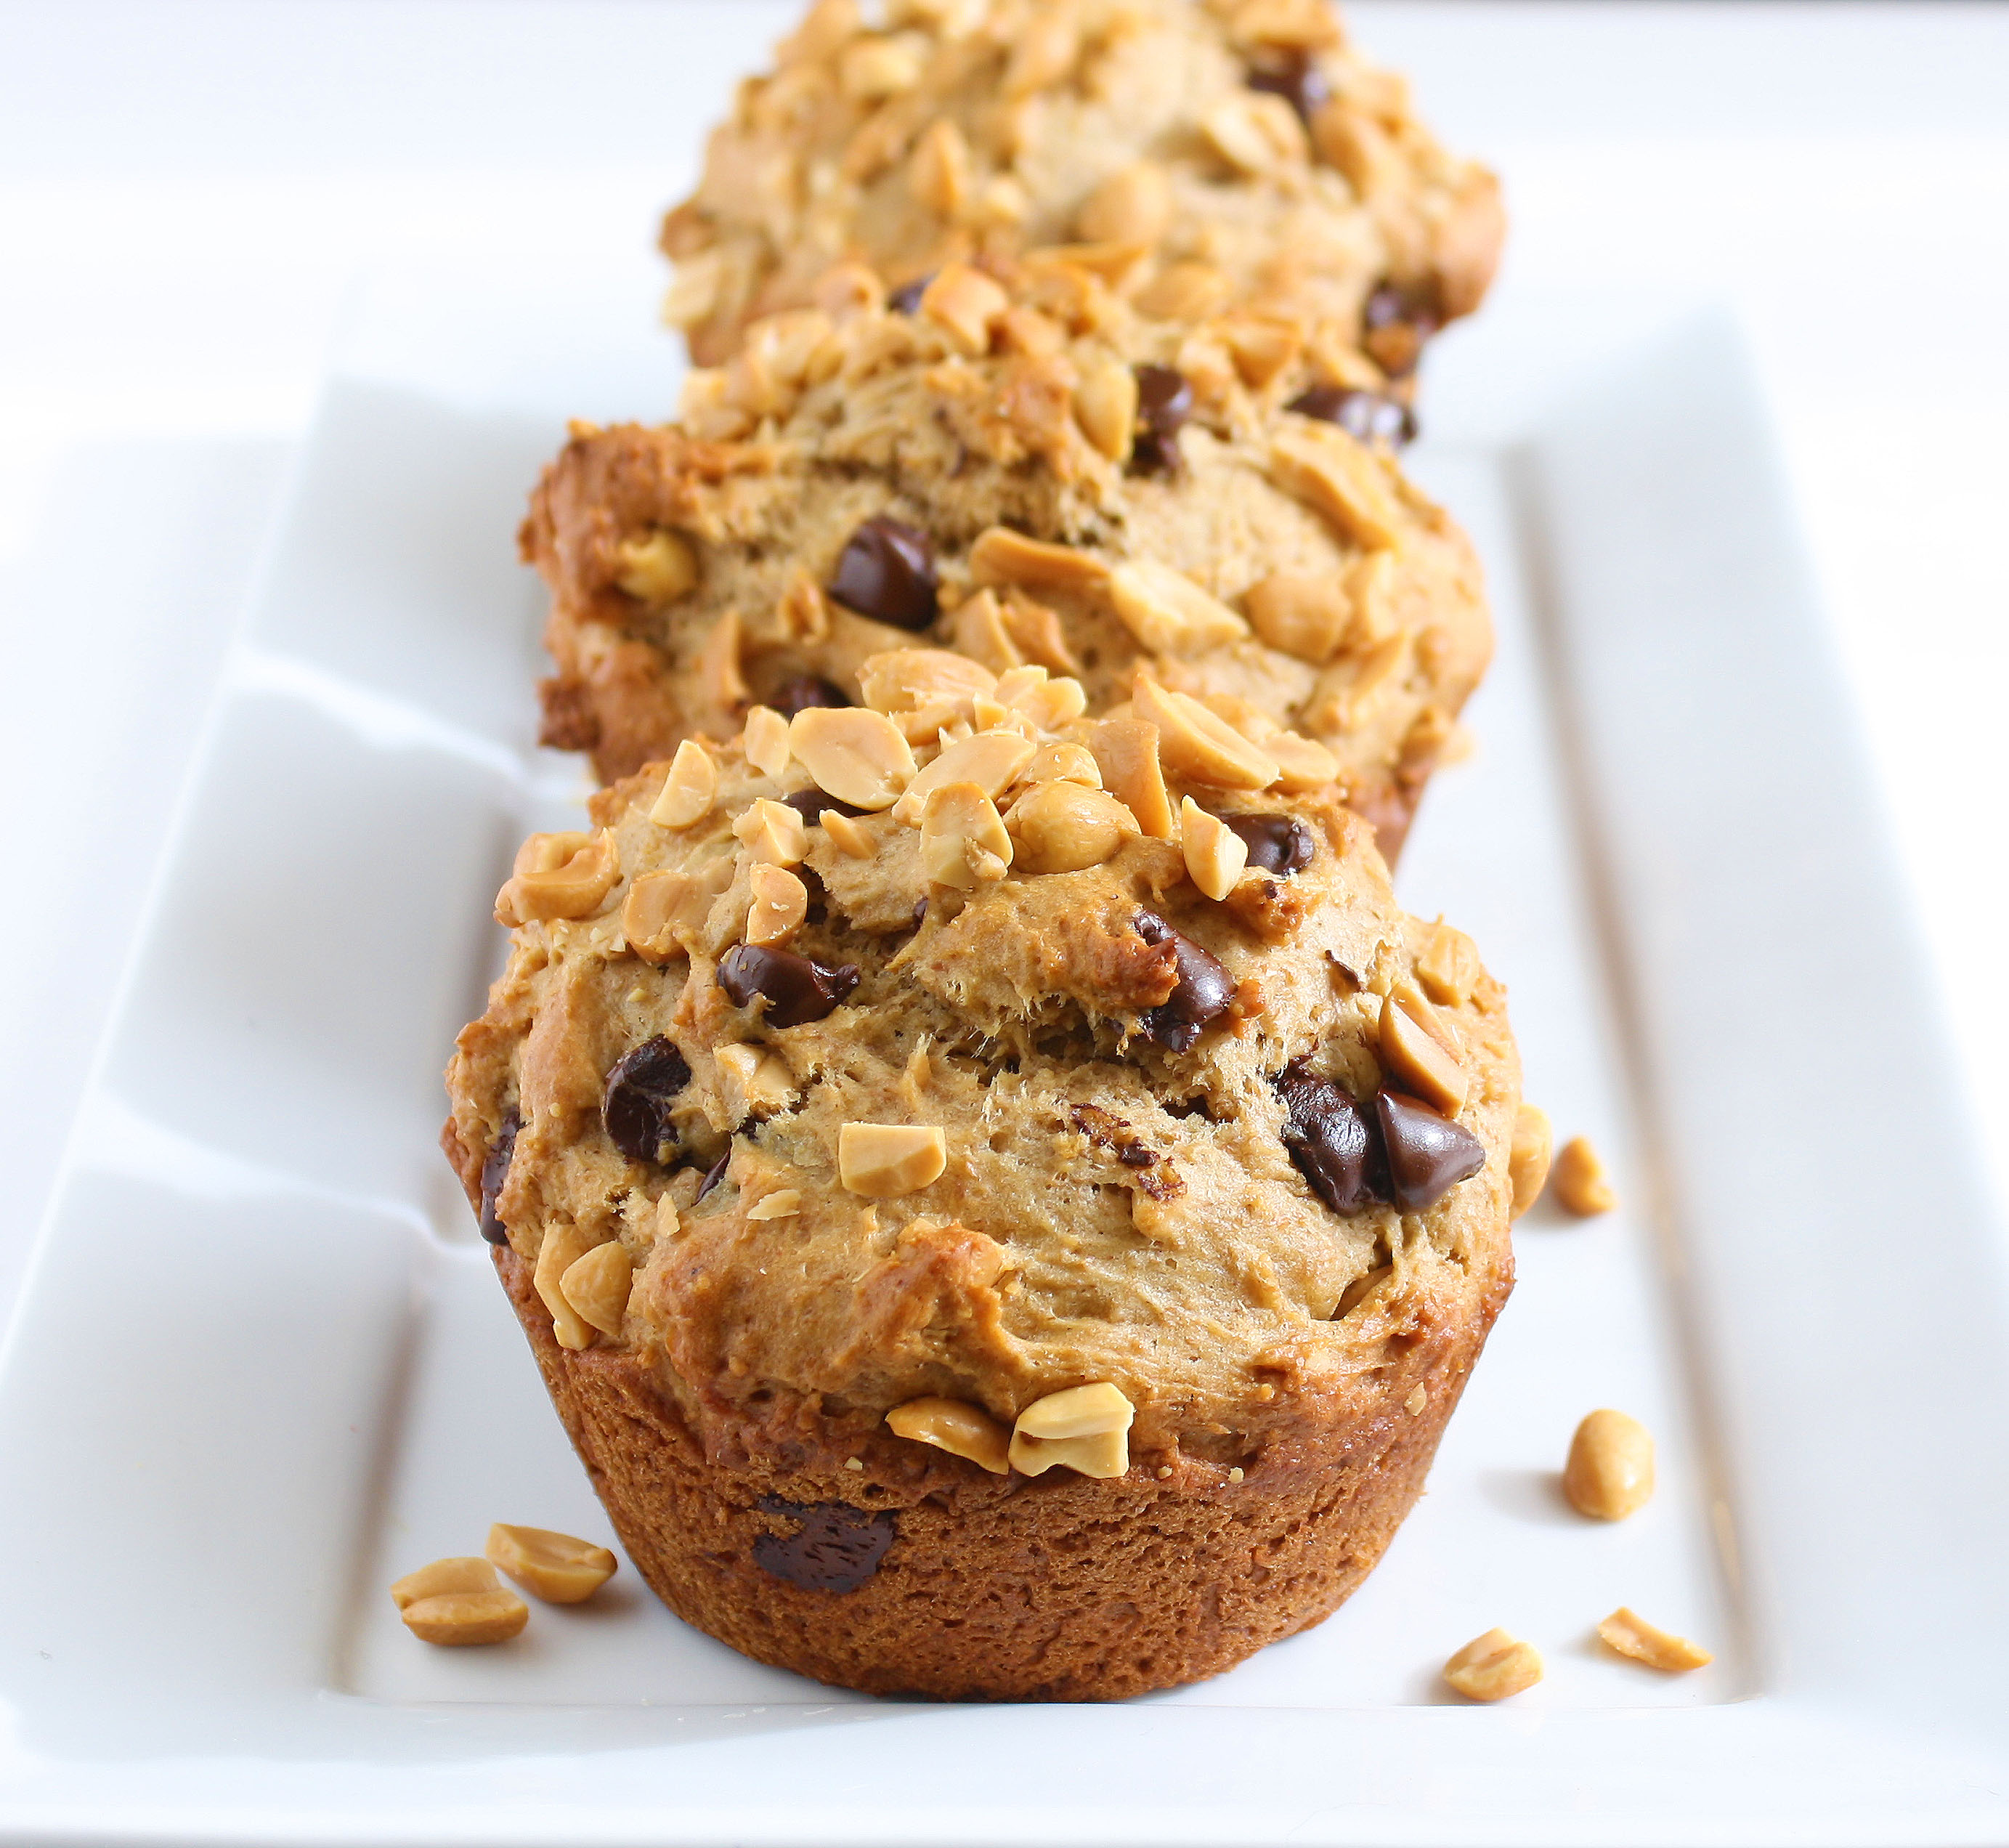 Whole Wheat Peanut Butter Muffins